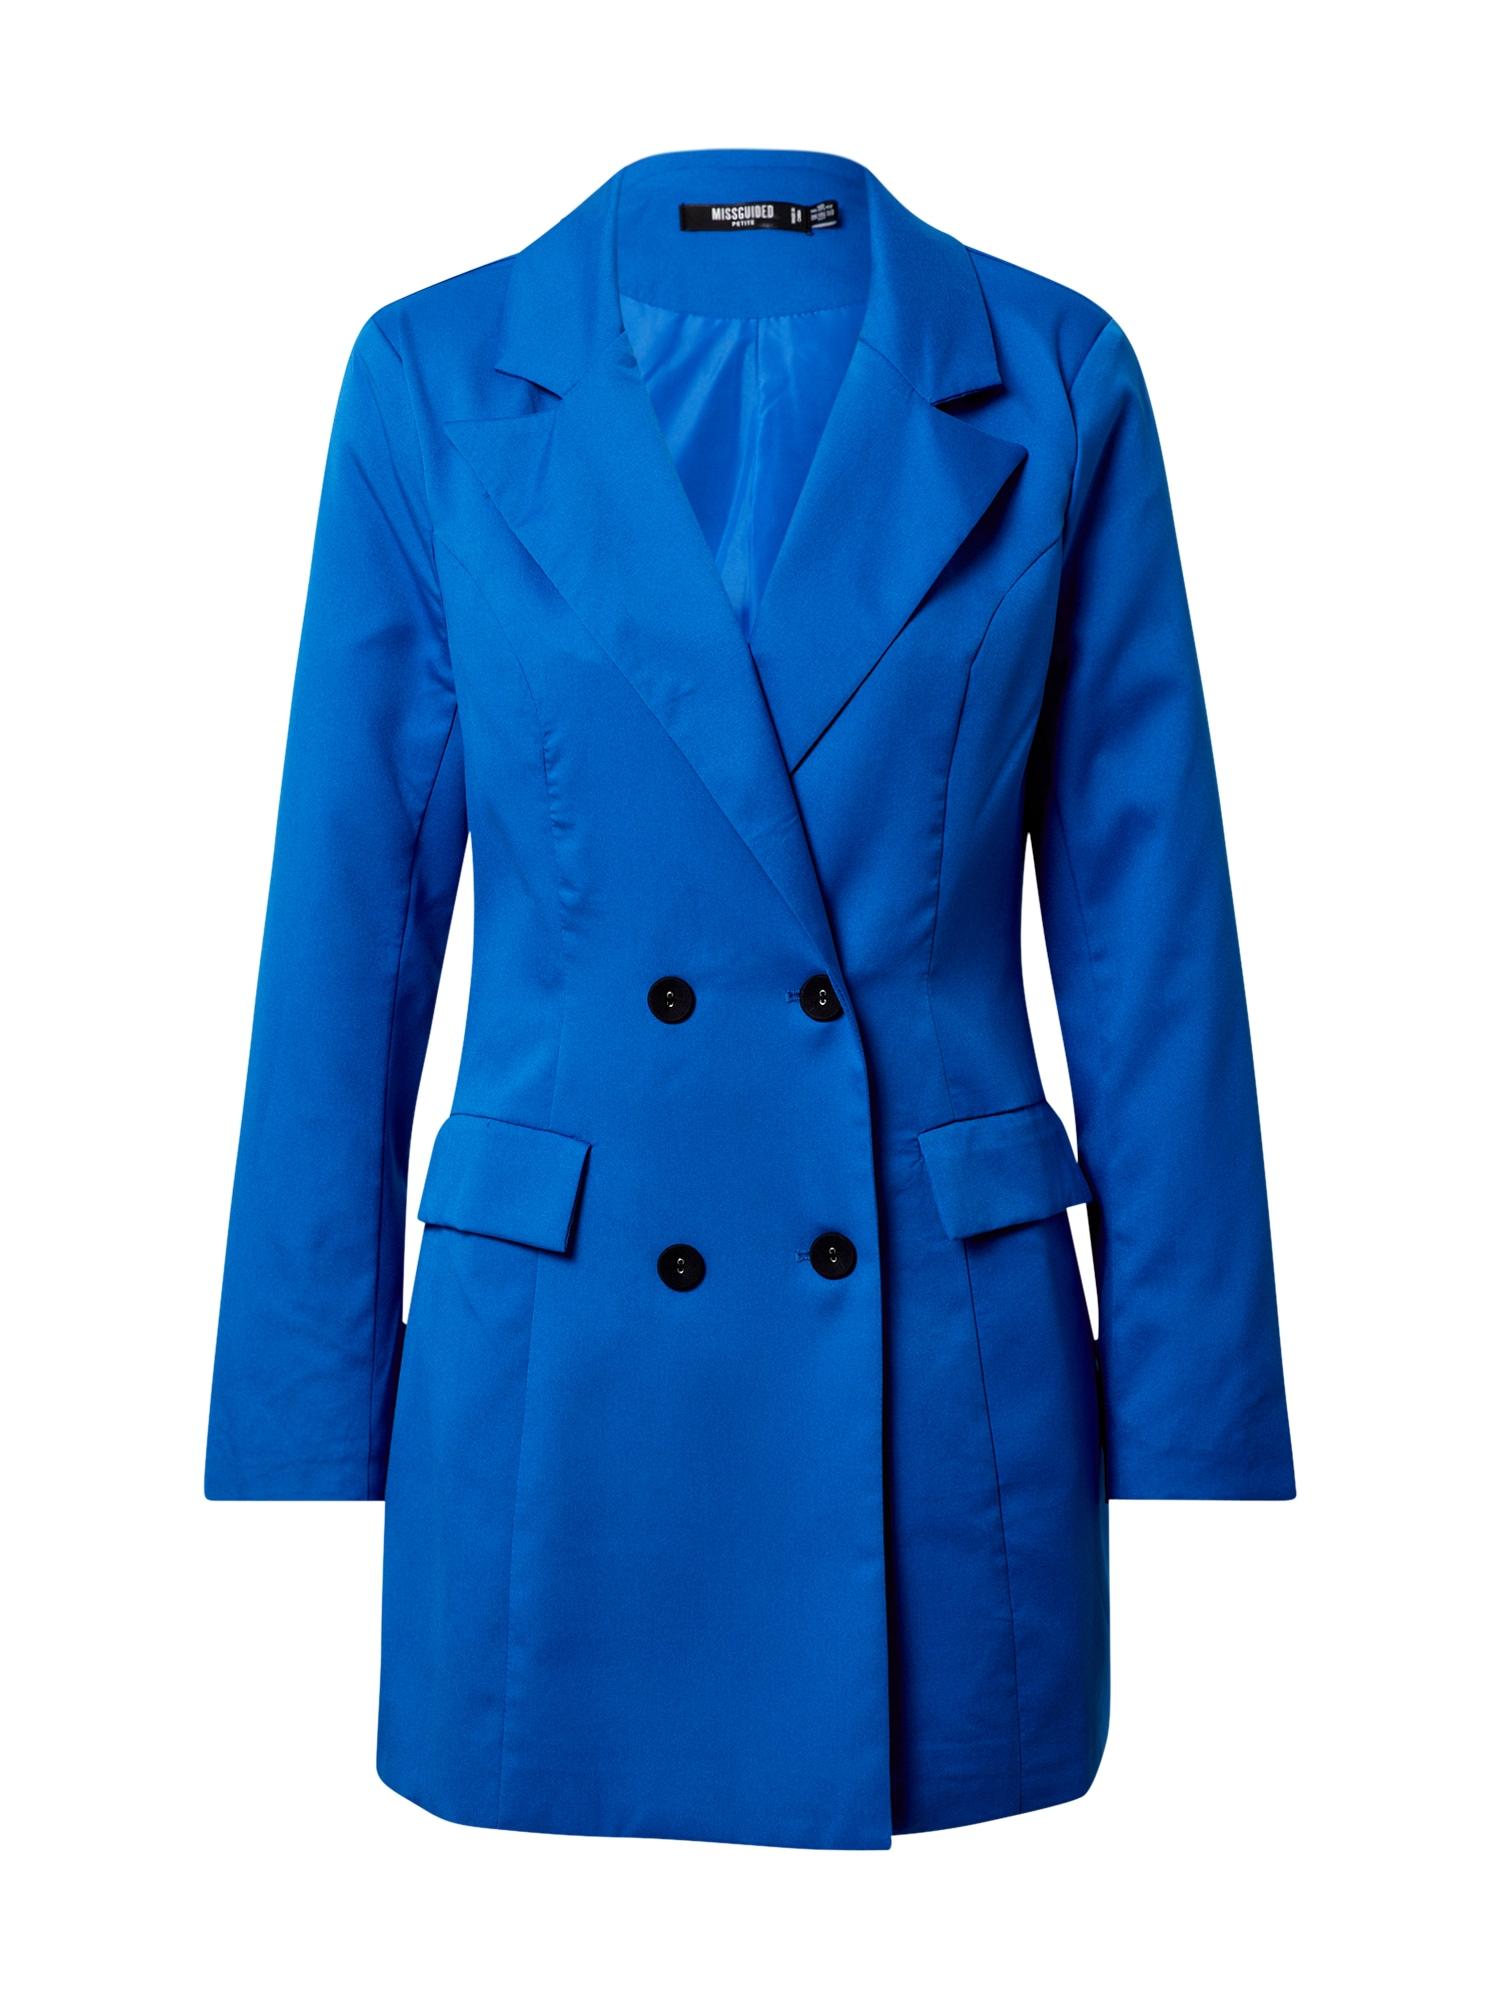 Missguided (Petite) Suknelė mėlyna